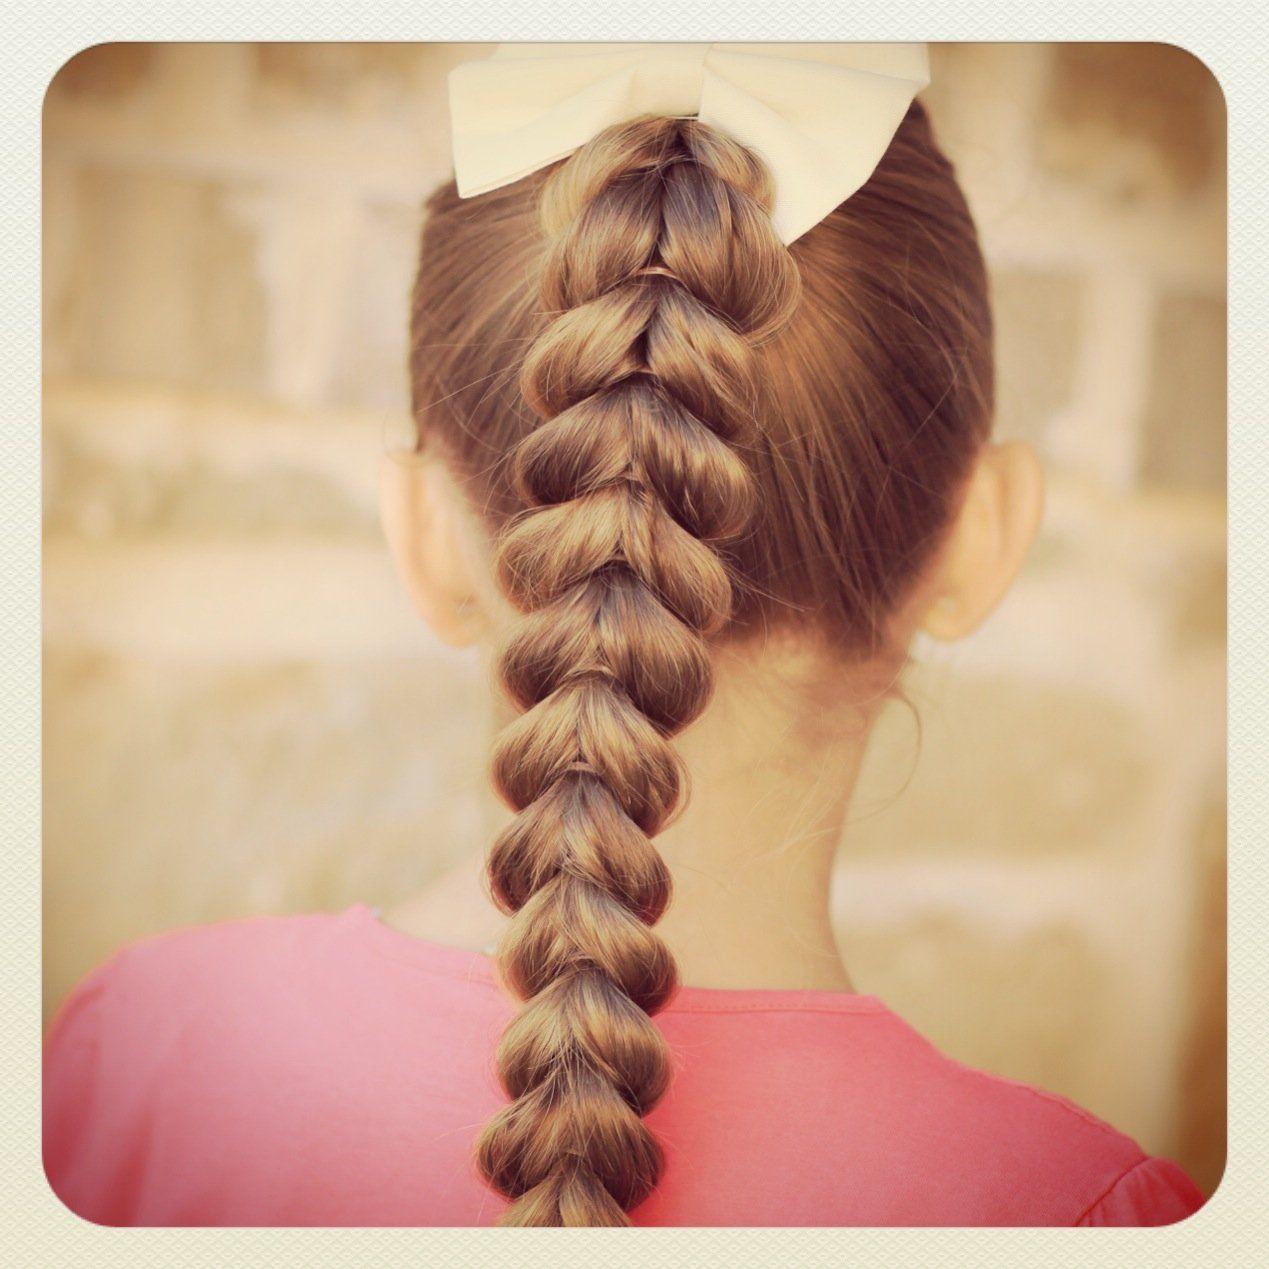 PullThrough Braid Easy Hairstyles Hairrr Pinterest Easy